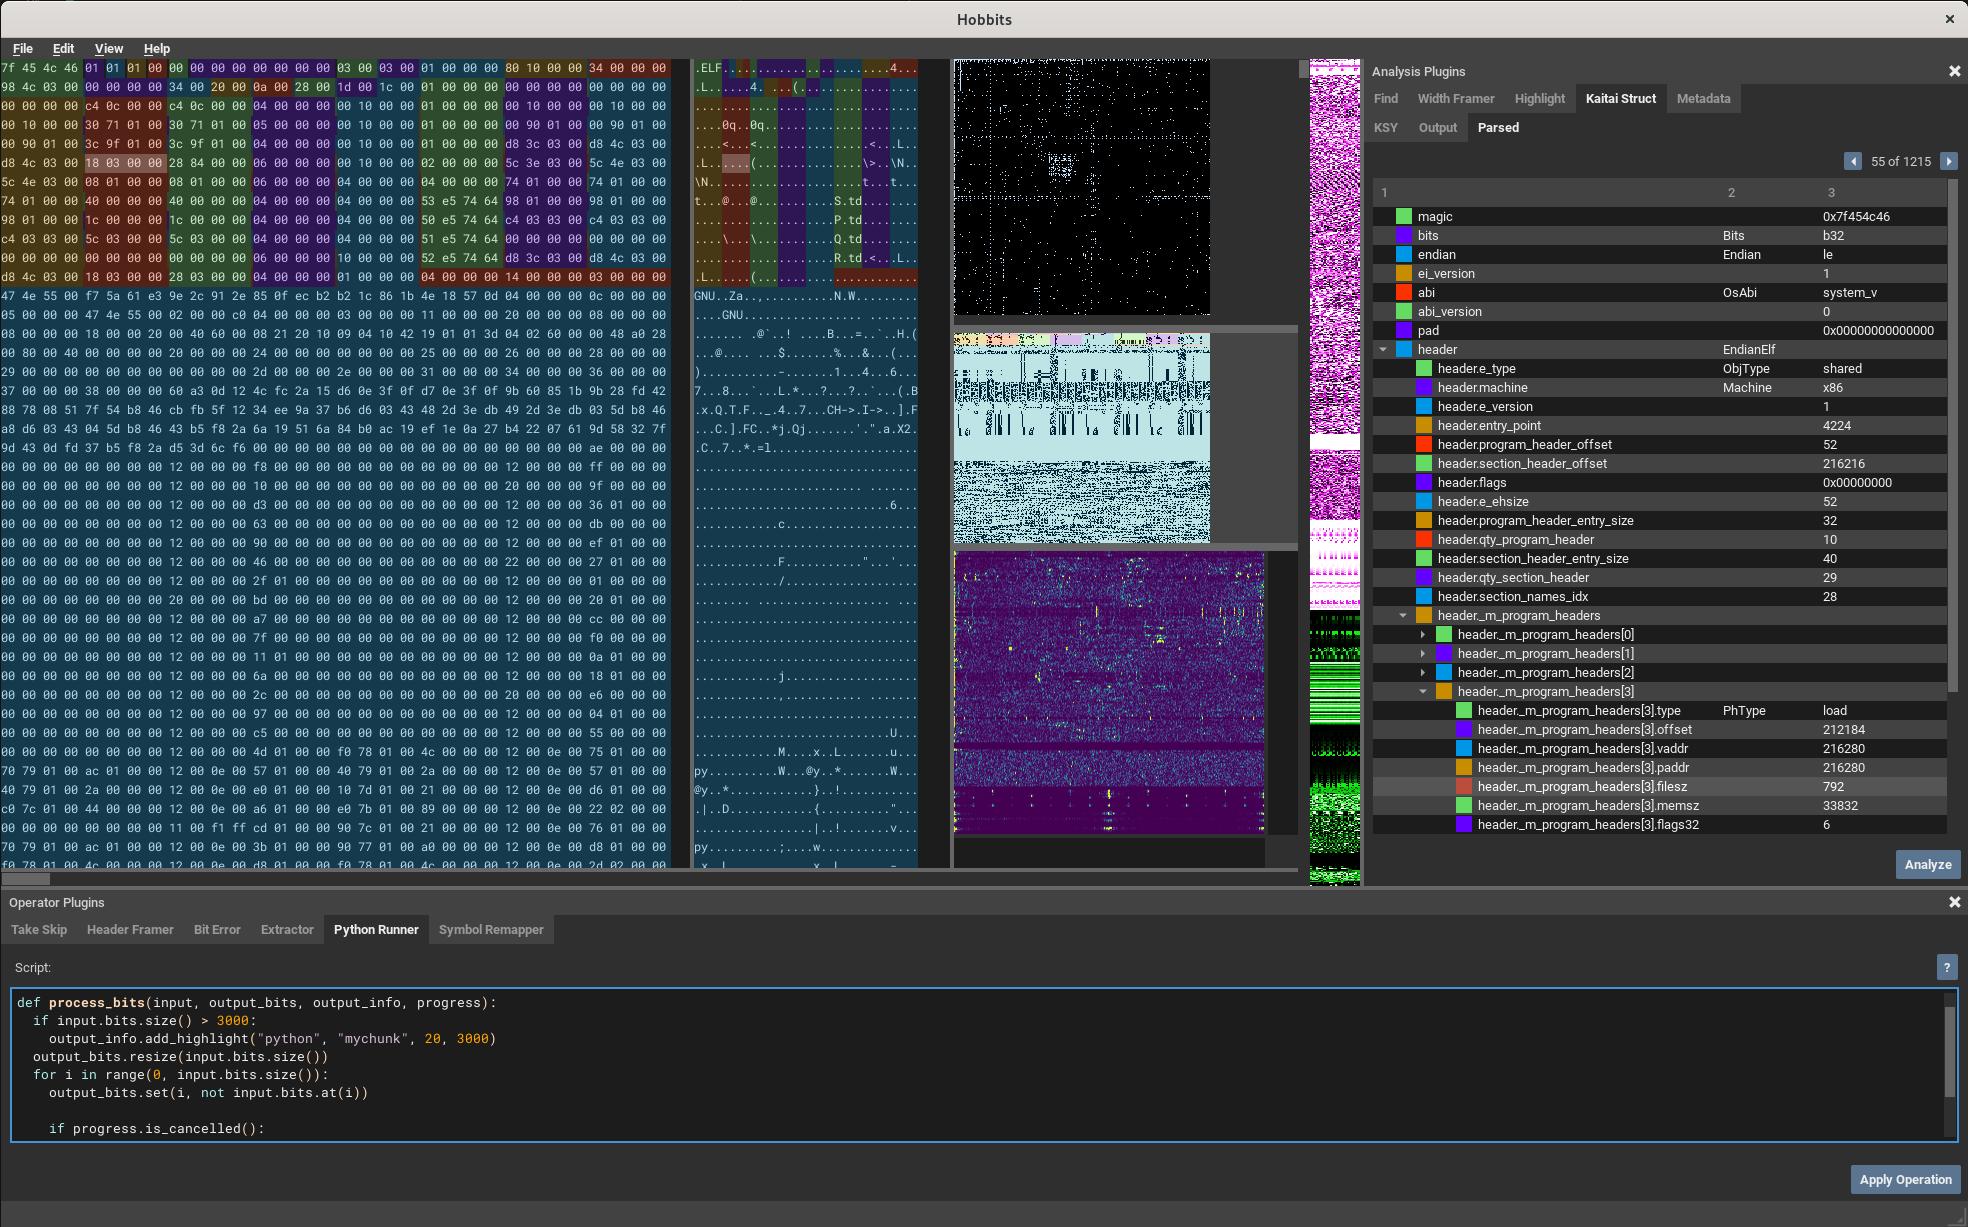 Screenshot of the Hobbits GUI